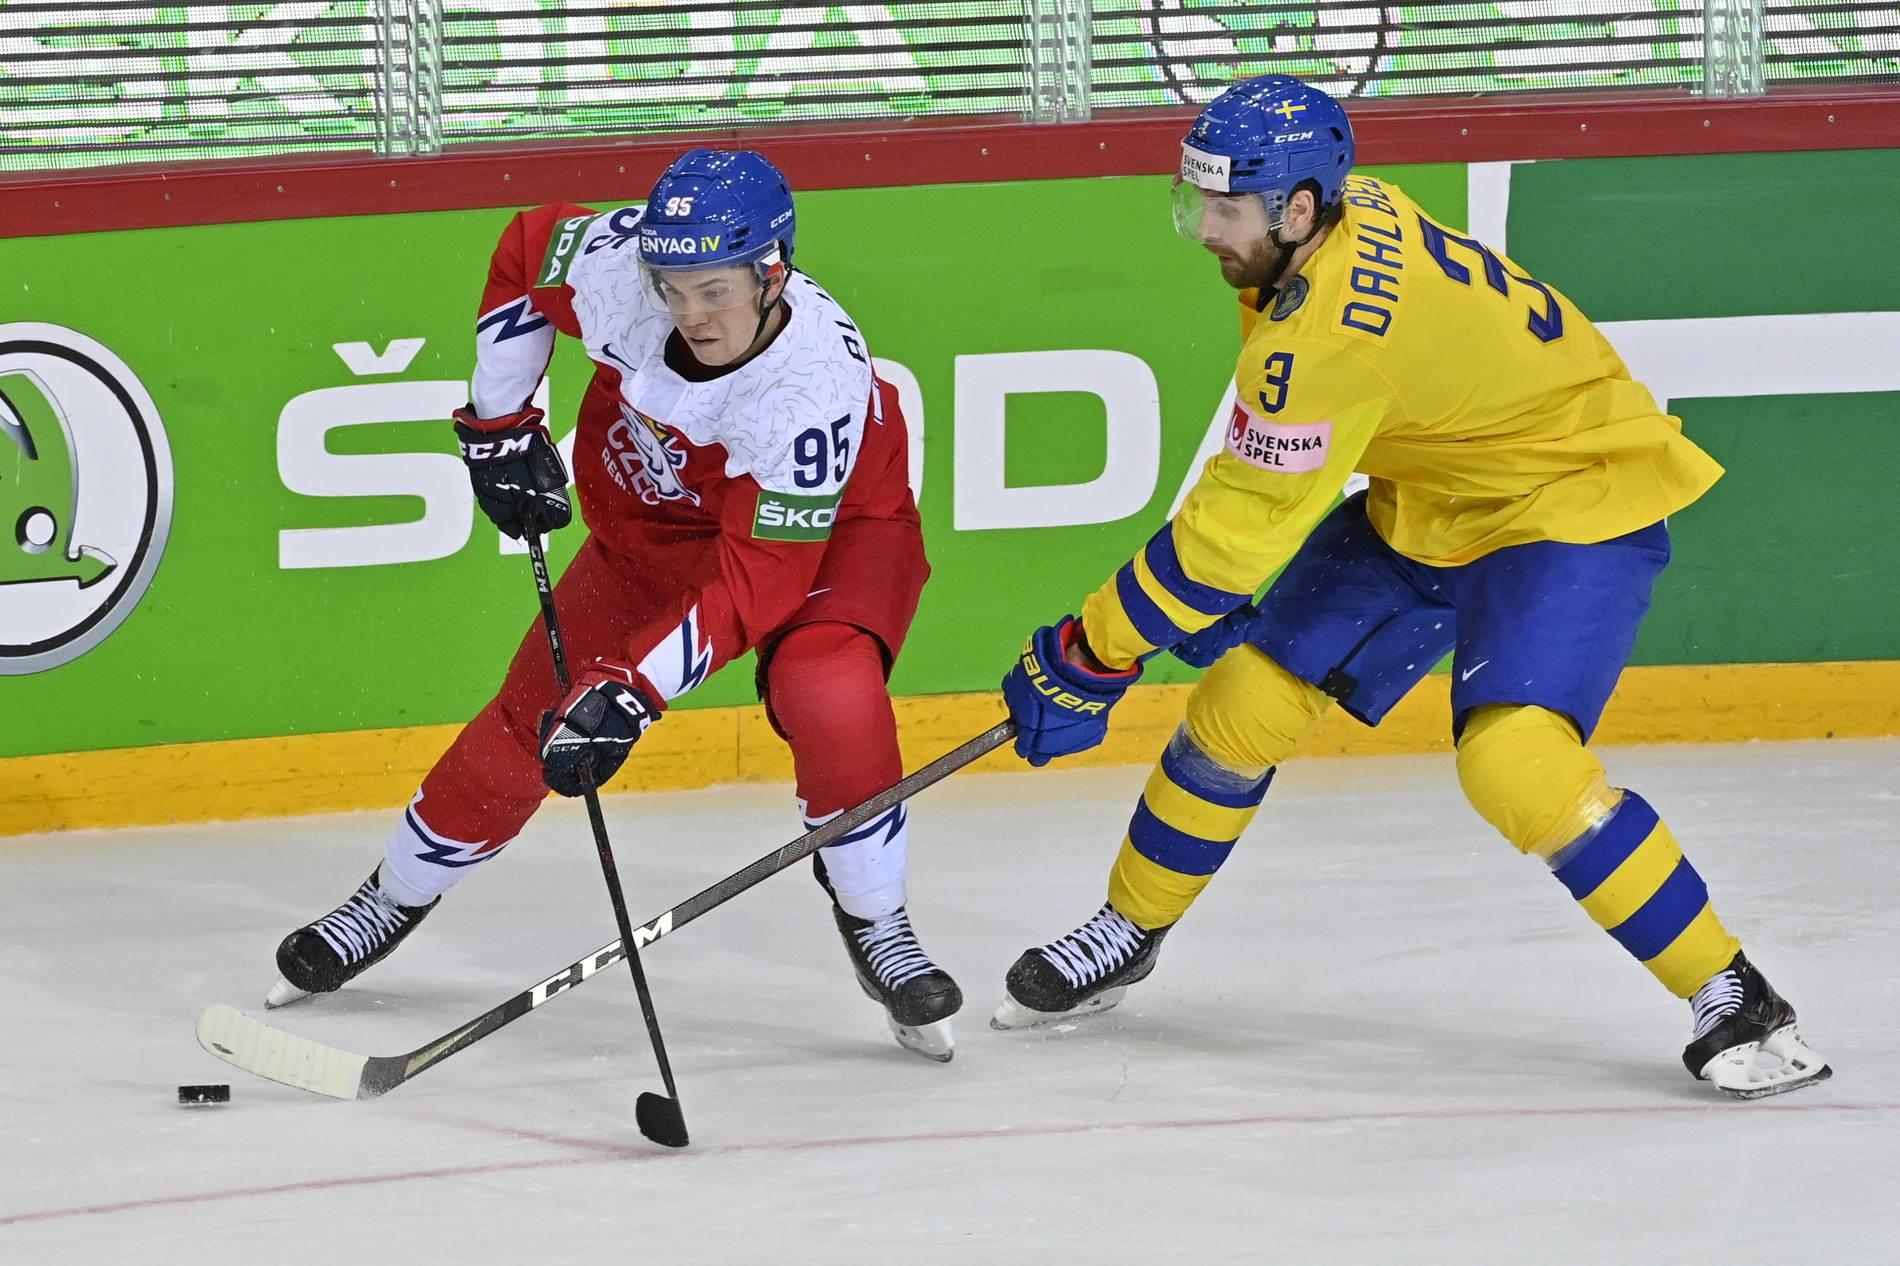 Eishockey Finale 2021